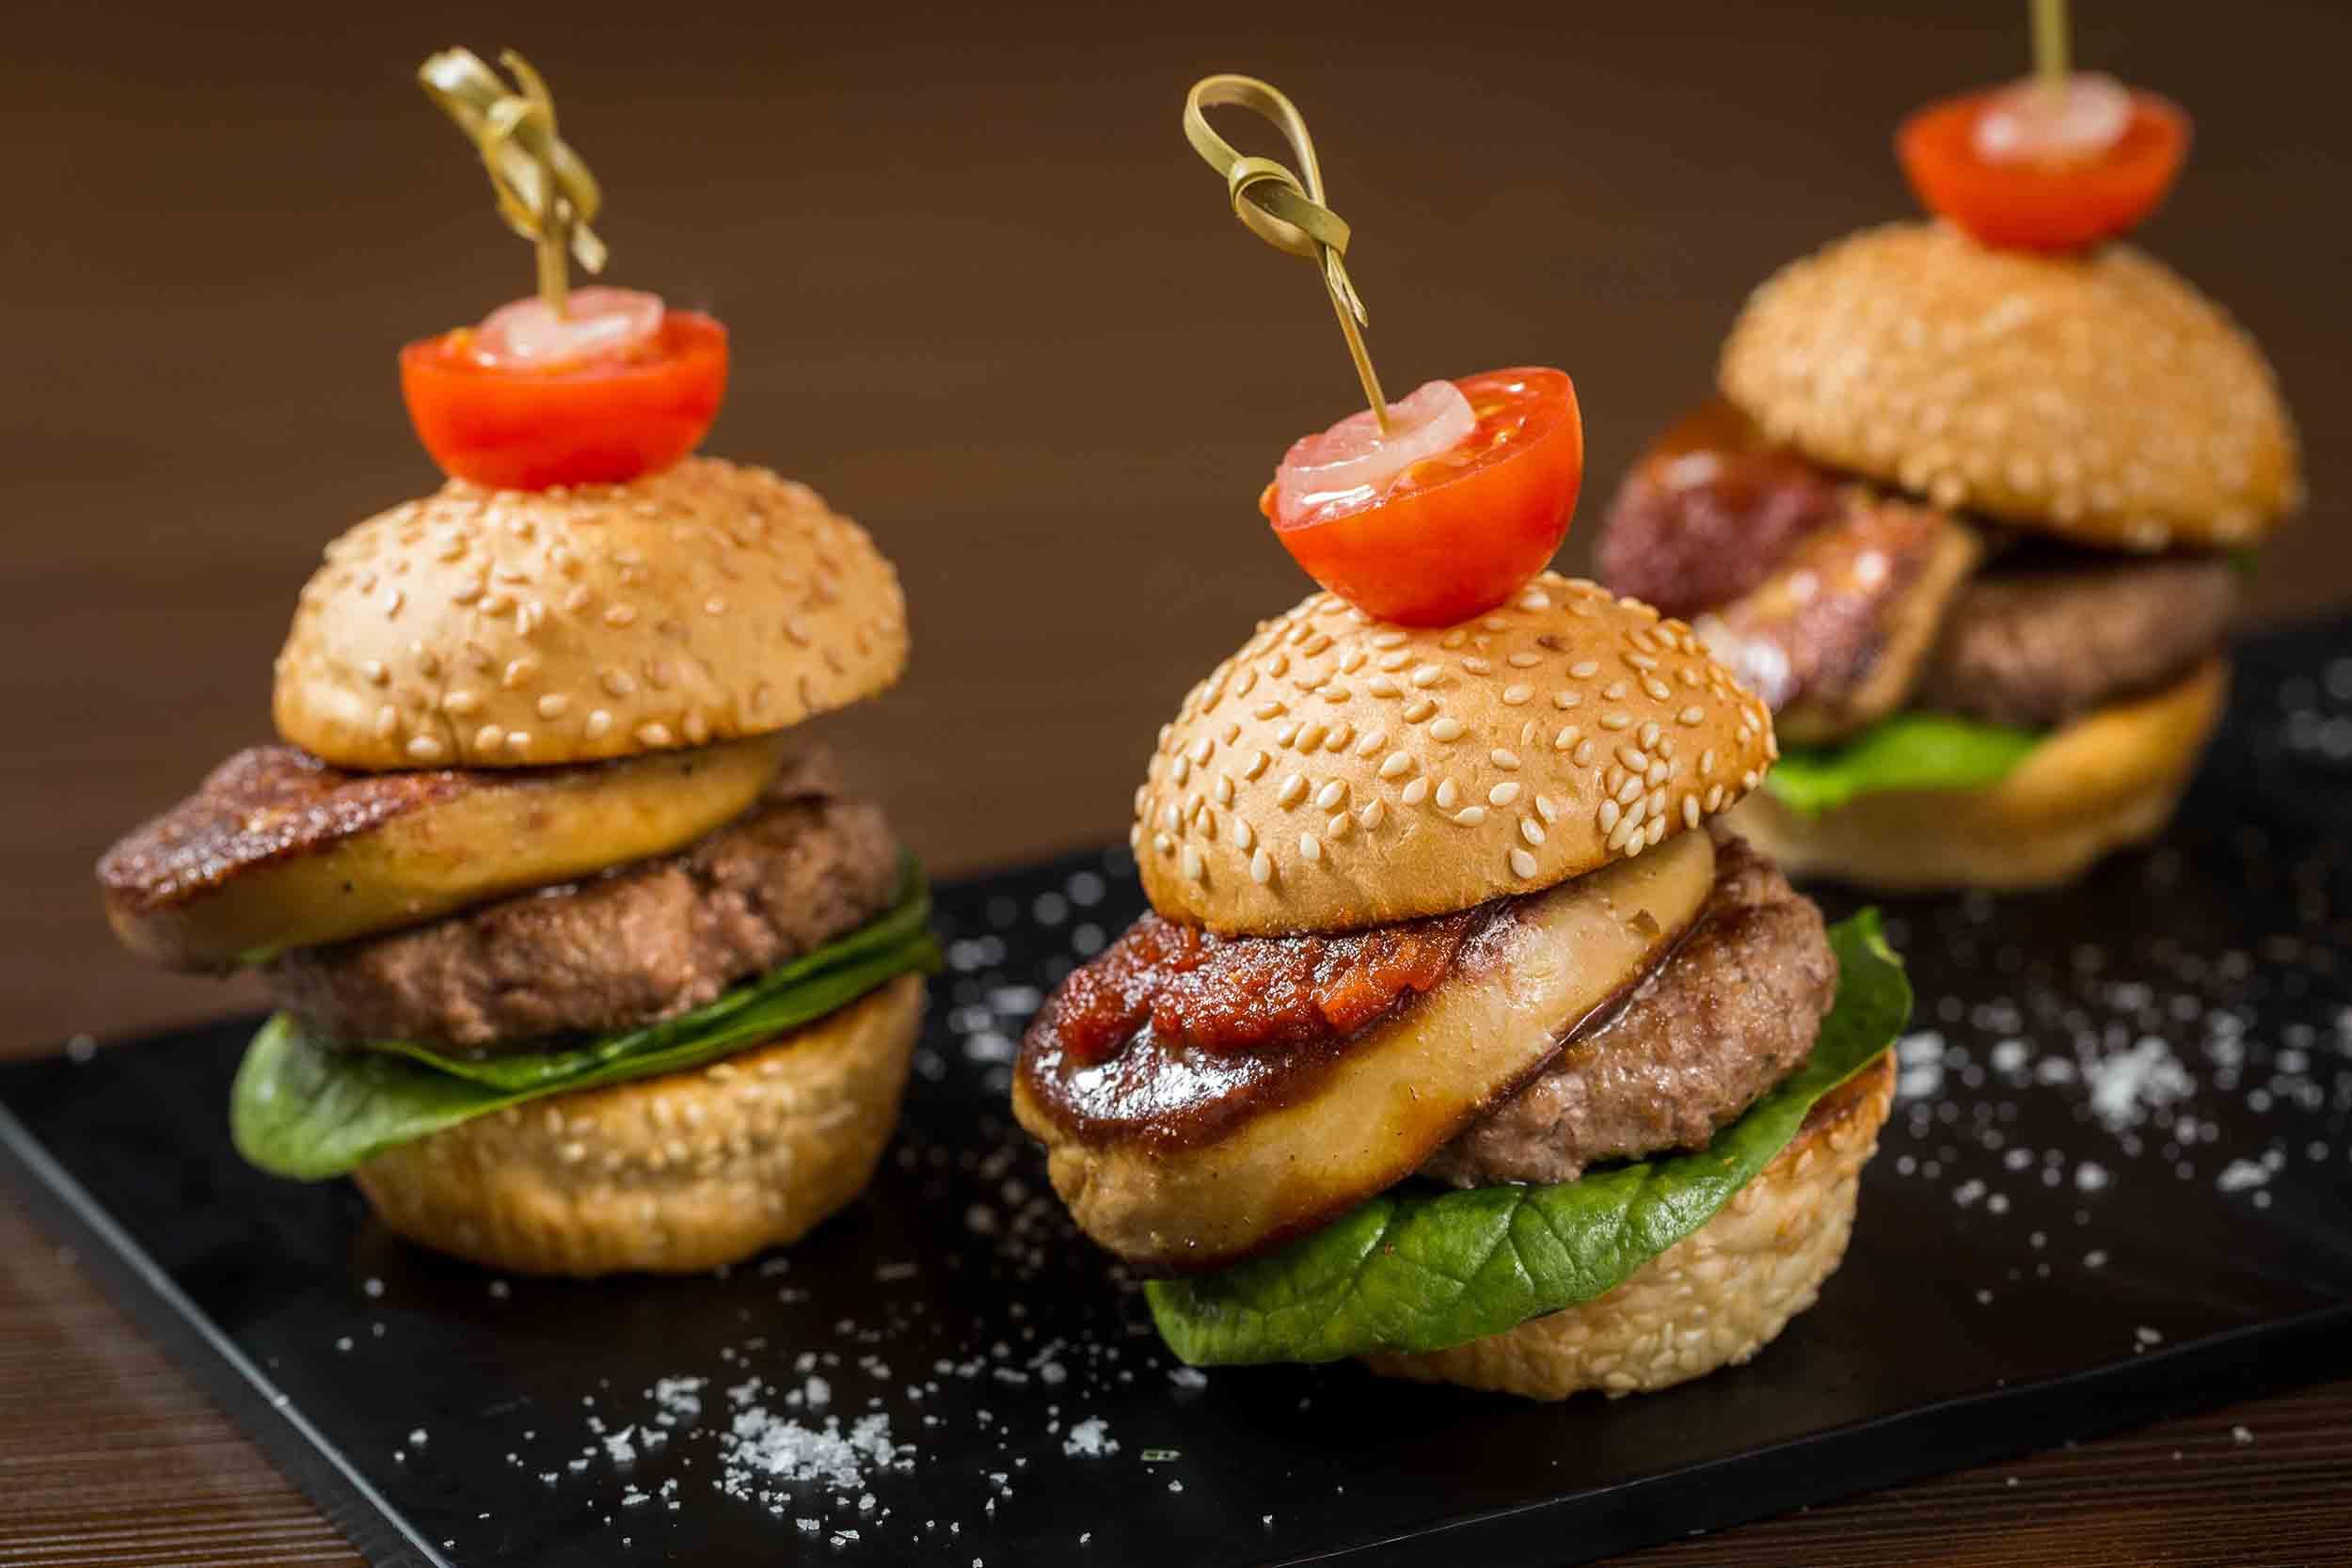 nwmhk_mini-foie-gras-burger-with-red-onion-jam-and-baby-spinach-%e8%bf%b7%e4%bd%a0%e9%b5%9d%e8%82%9d%e6%bc%a2%e5%a0%a1%e4%bc%b4%e7%b4%85%e6%b4%8b%e8%94%a5%e9%86%a4%e5%8f%8a%e8%8f%a0%e8%8f%9c%e8%91%89_